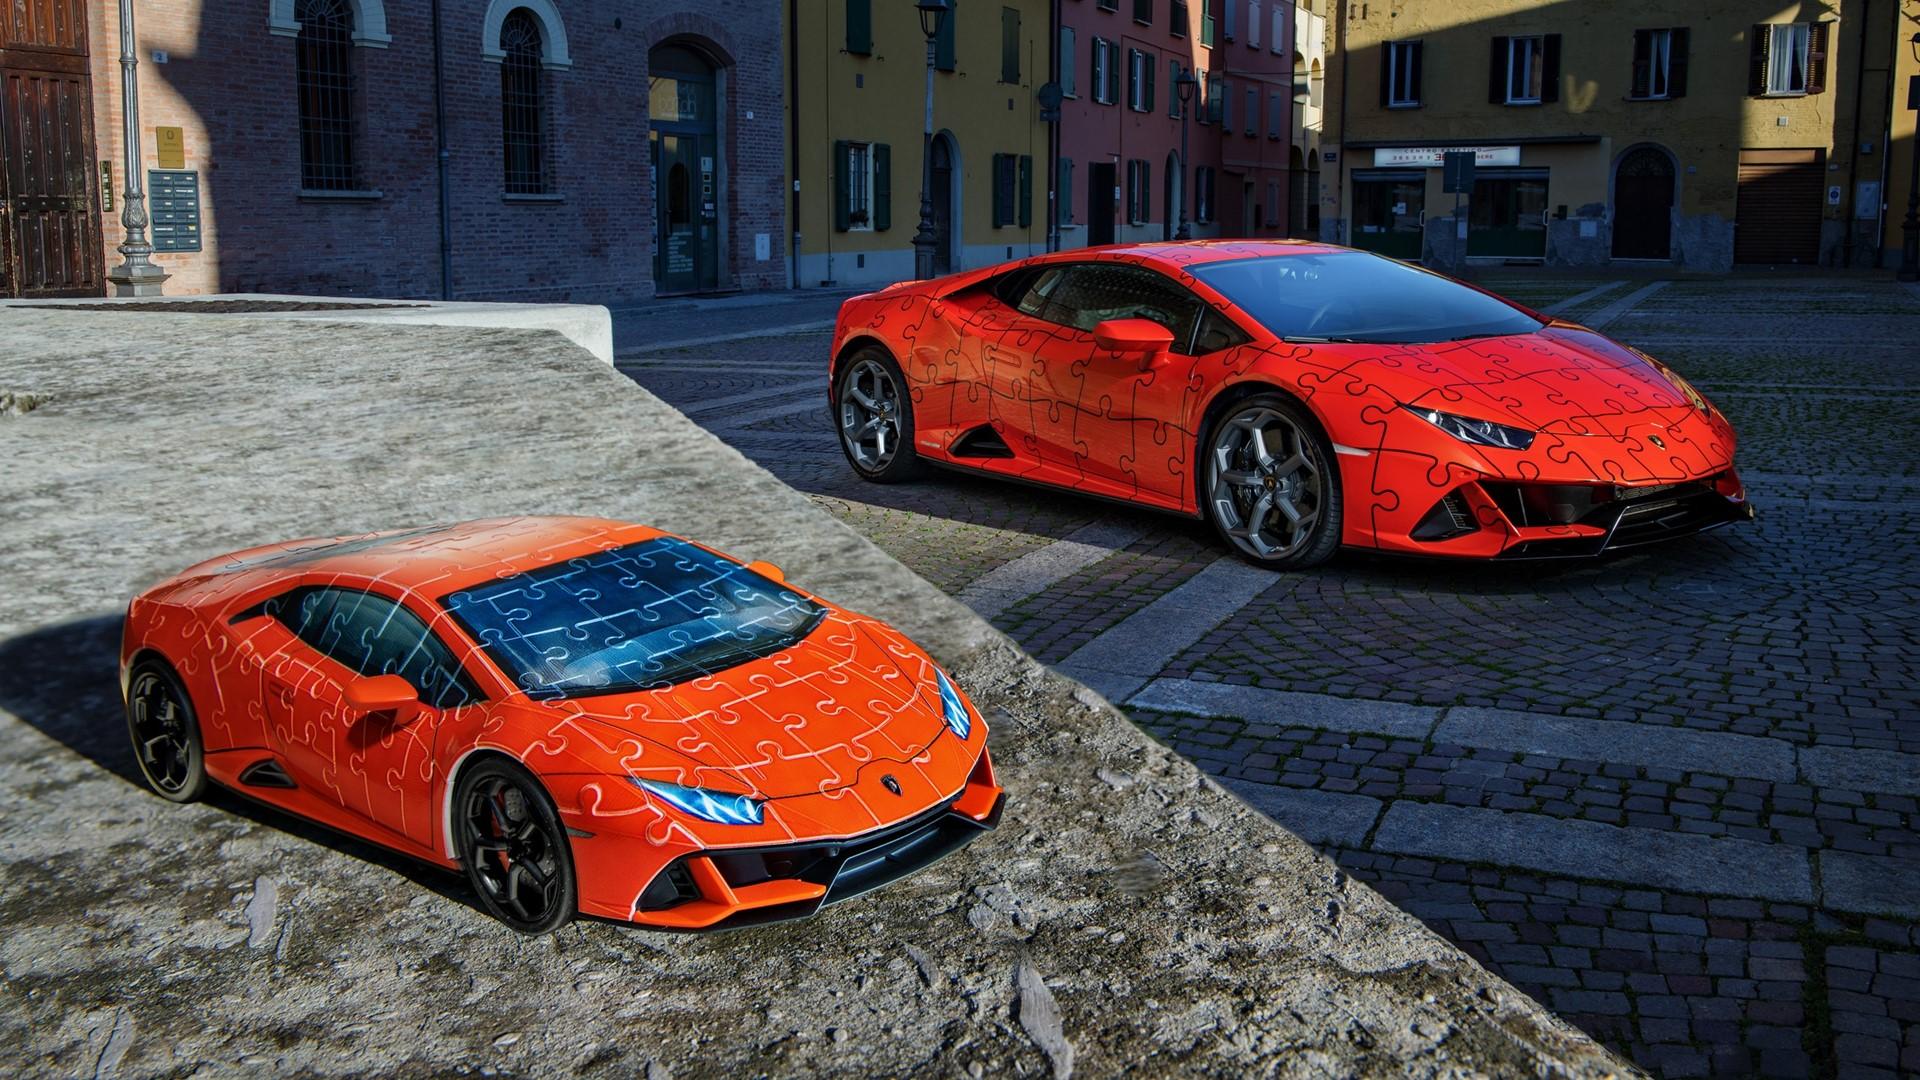 The Lamborghini Huracán EVO: build a super sports car in a 3D jigsaw puzzle - Image 1